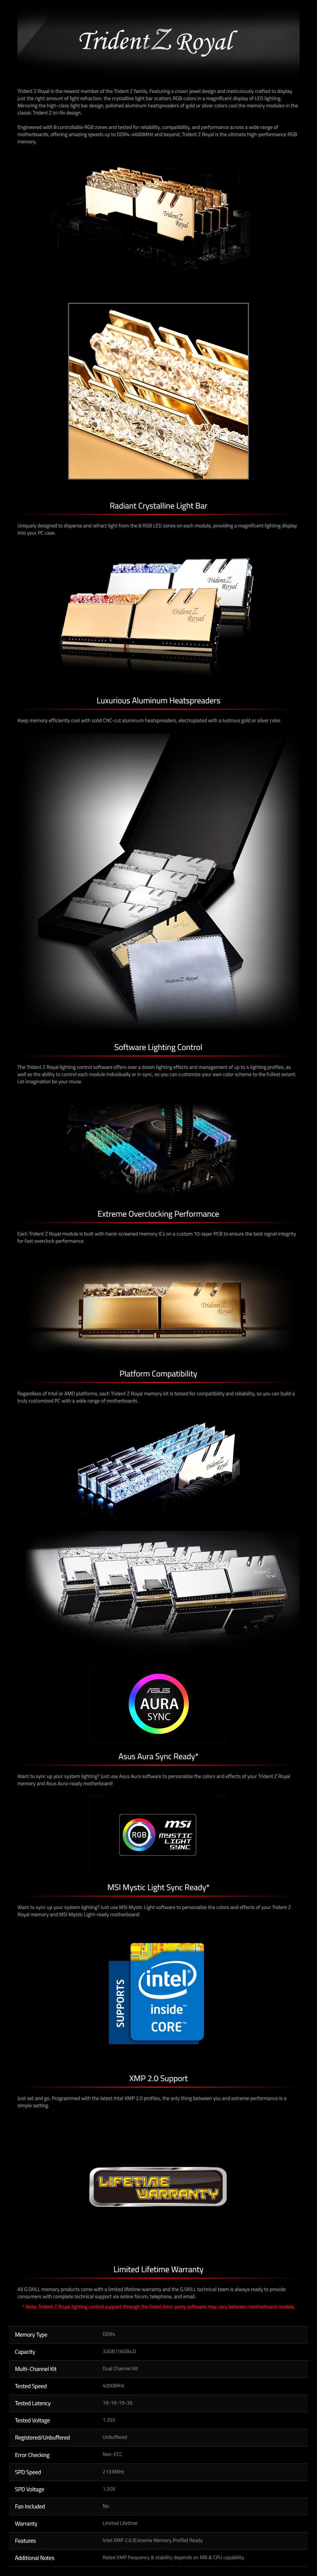 G.SKill Trident Z RGB Royal 32GB (2x 16GB) DDR4 4000MHz Memory - Silver - Desktop Overview 1